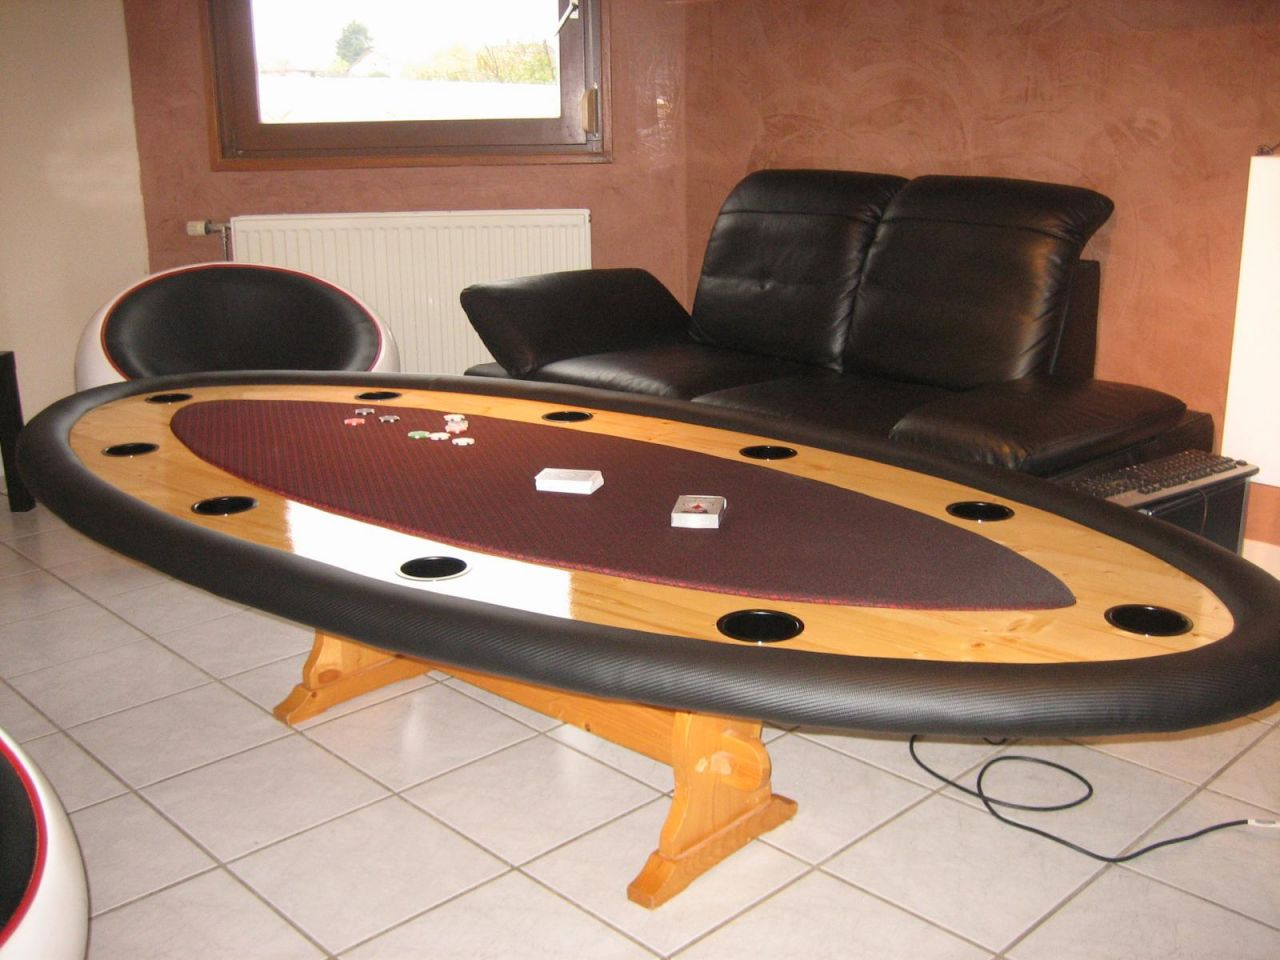 Copie de table poker blog 199.gmt.jpg